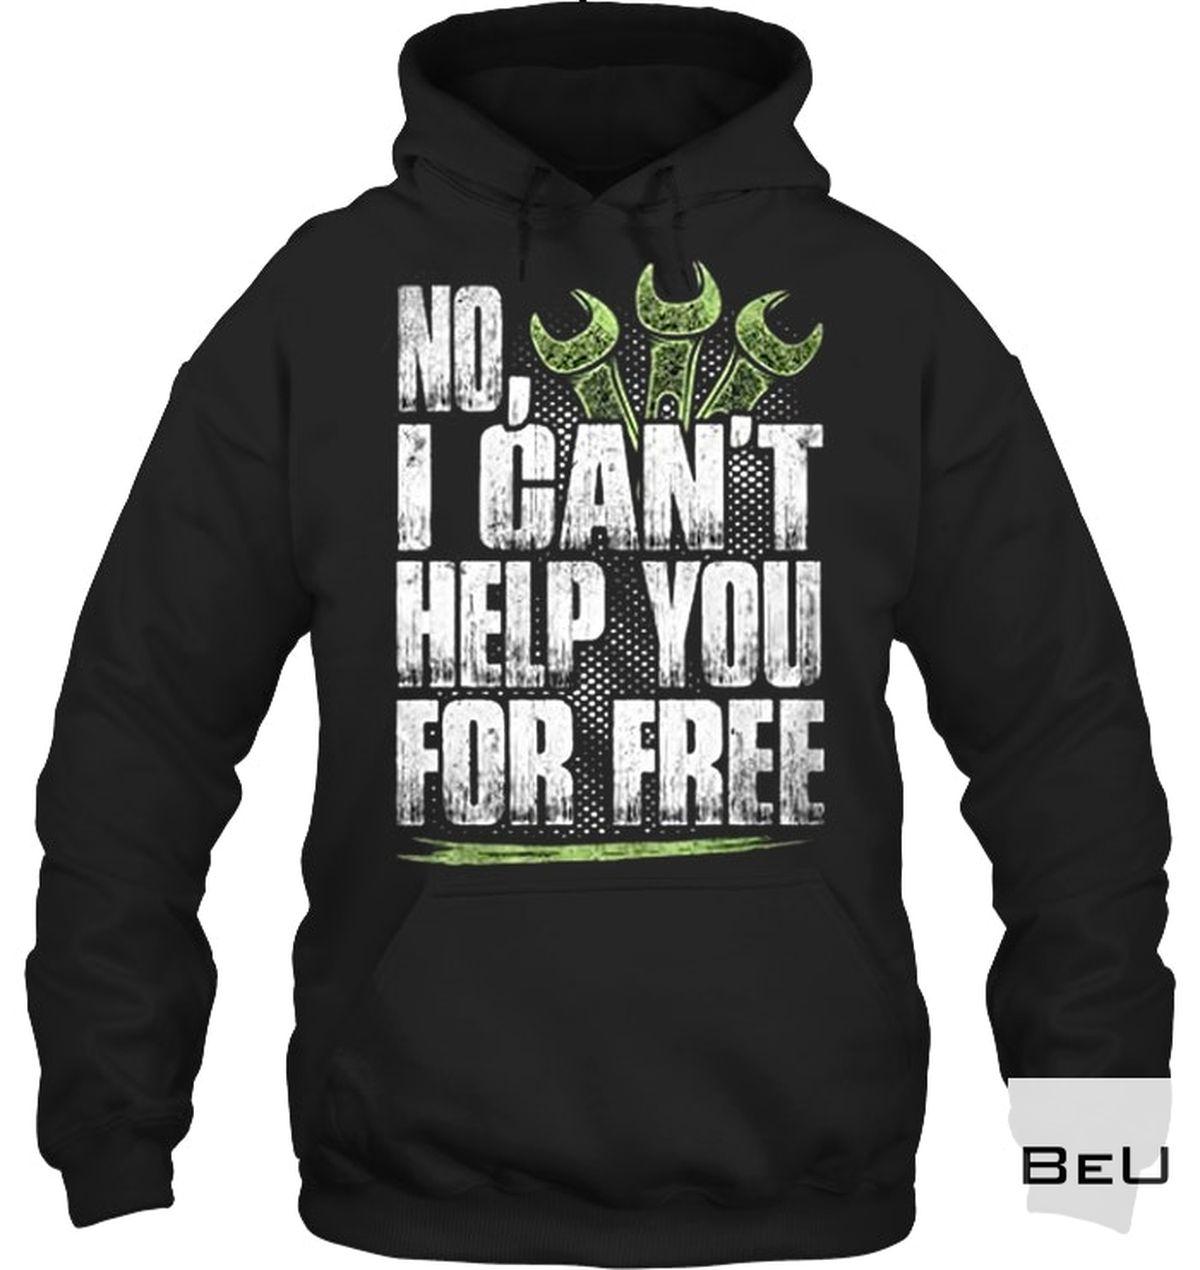 Free No Help You For Free Shirt